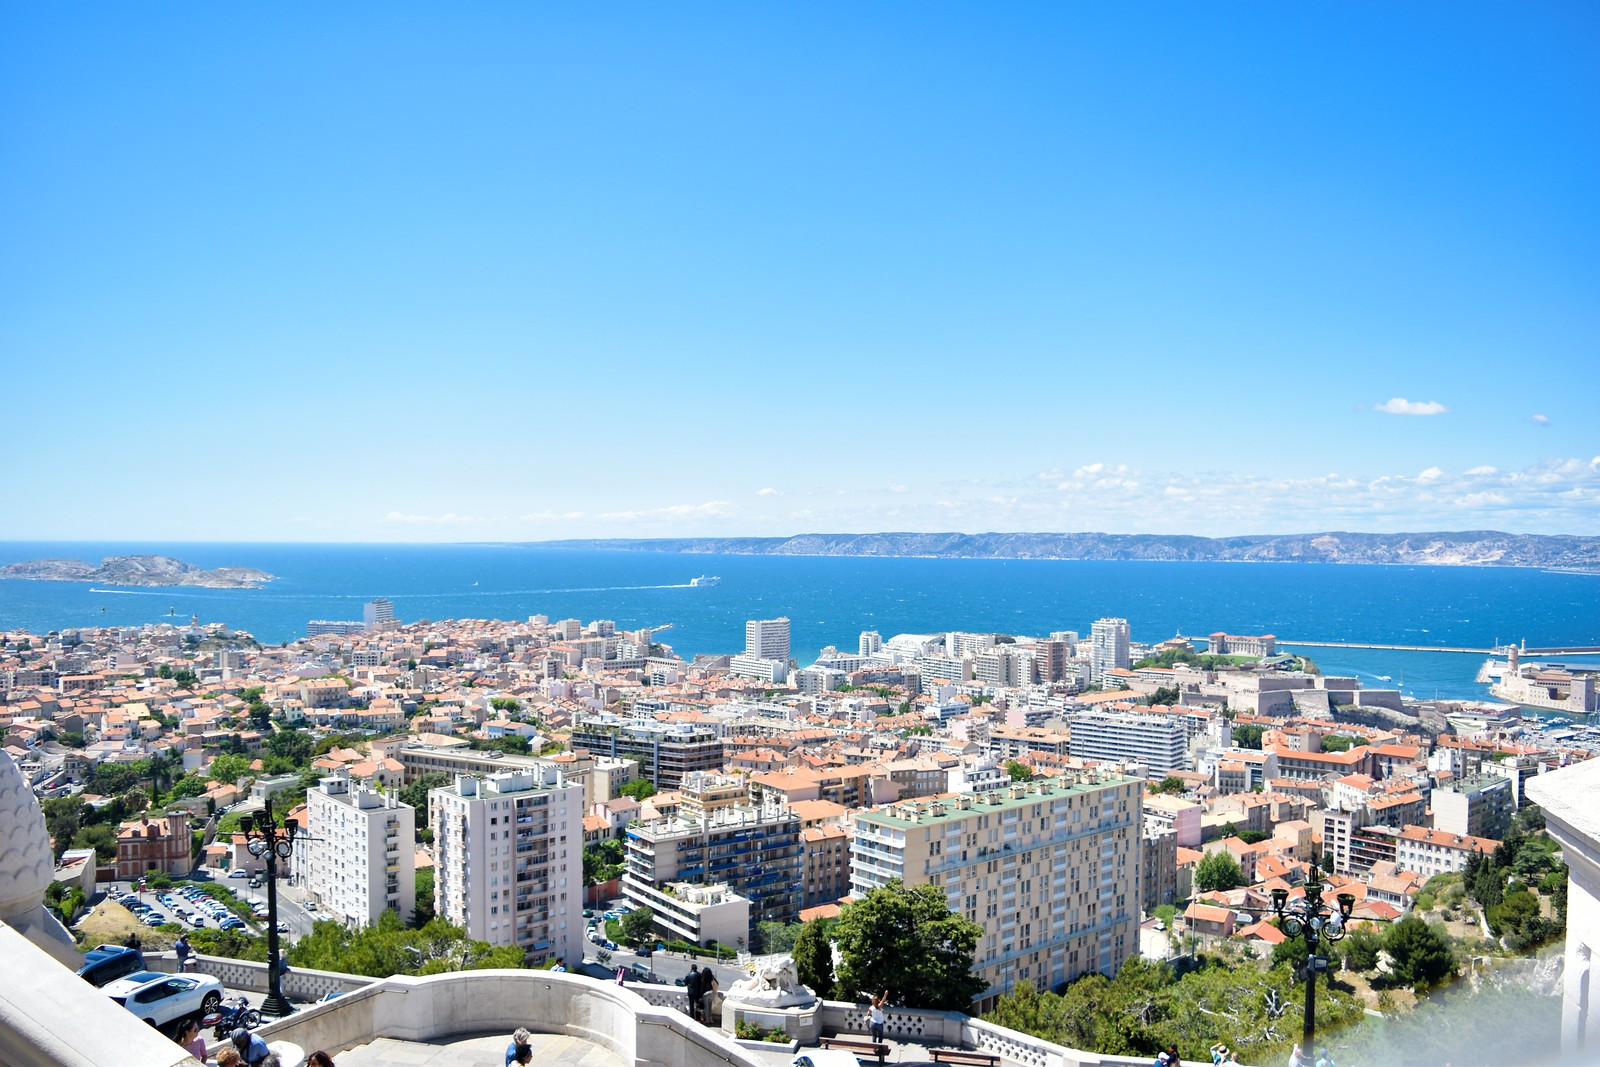 view of Marseille from the Notre Dame de la Garde